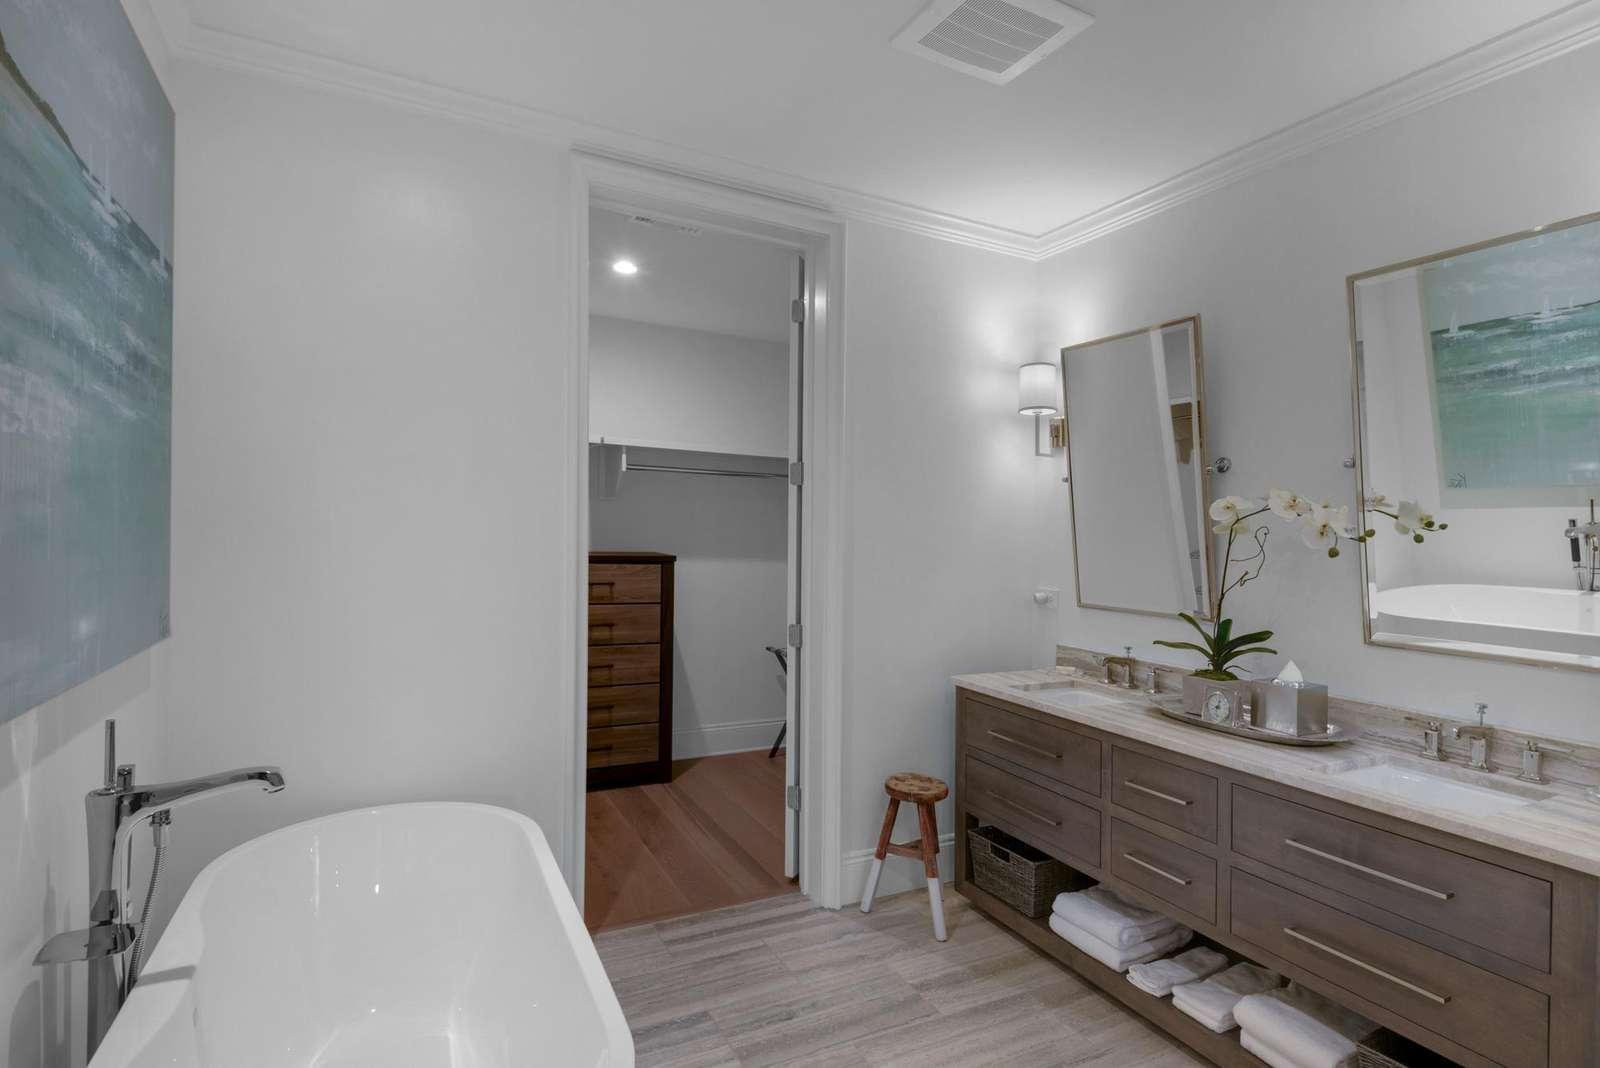 Soaking tub-double vanity sinks